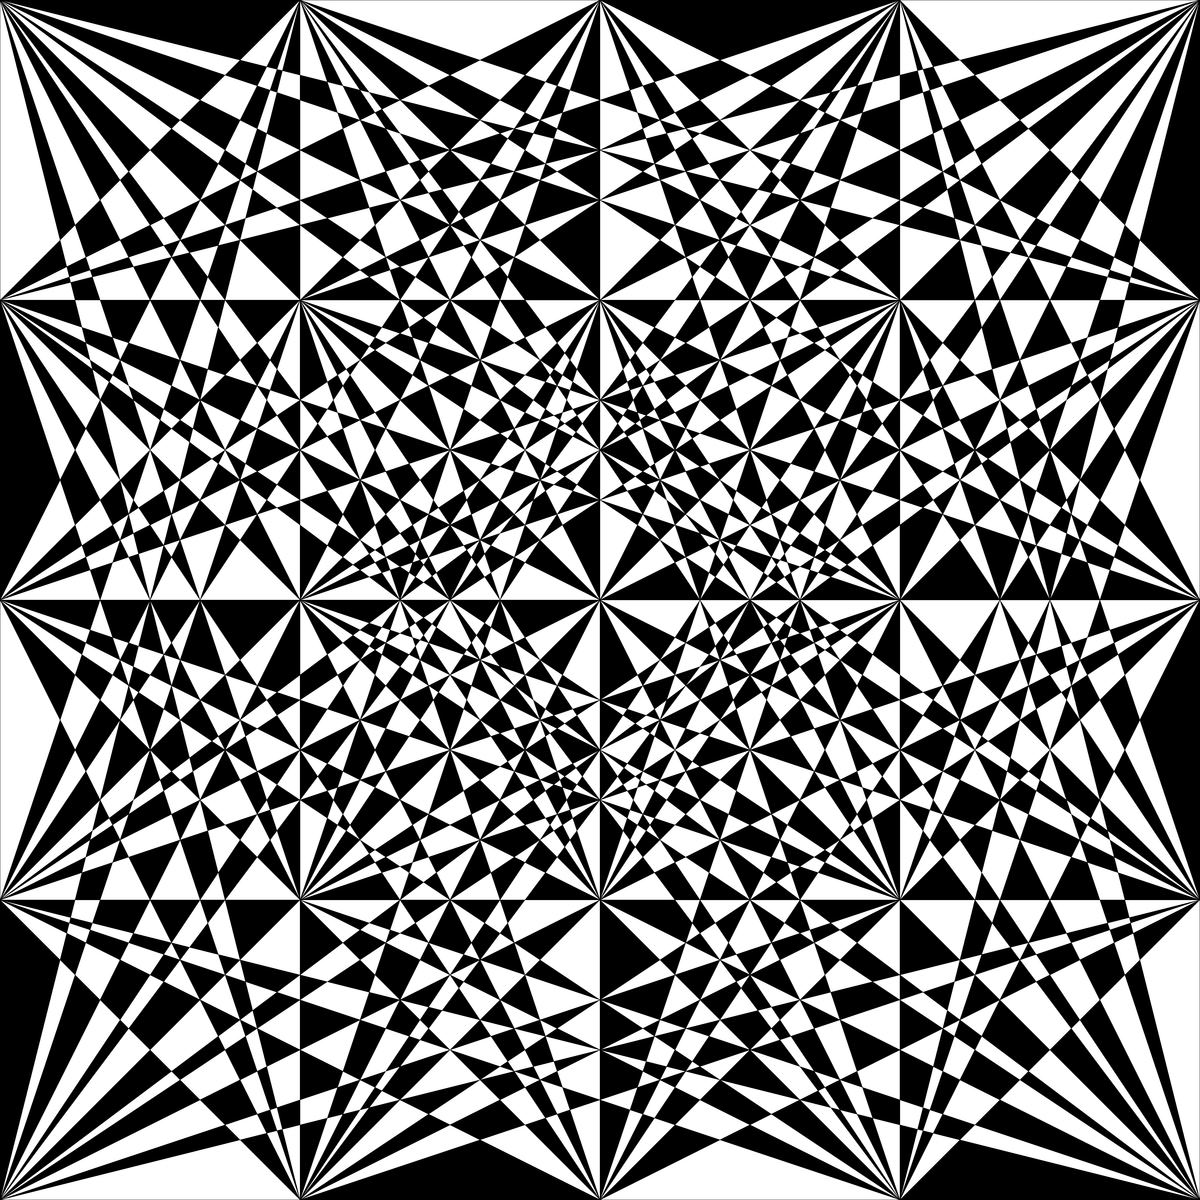 f:id:Hassium277:20200217210953p:plain